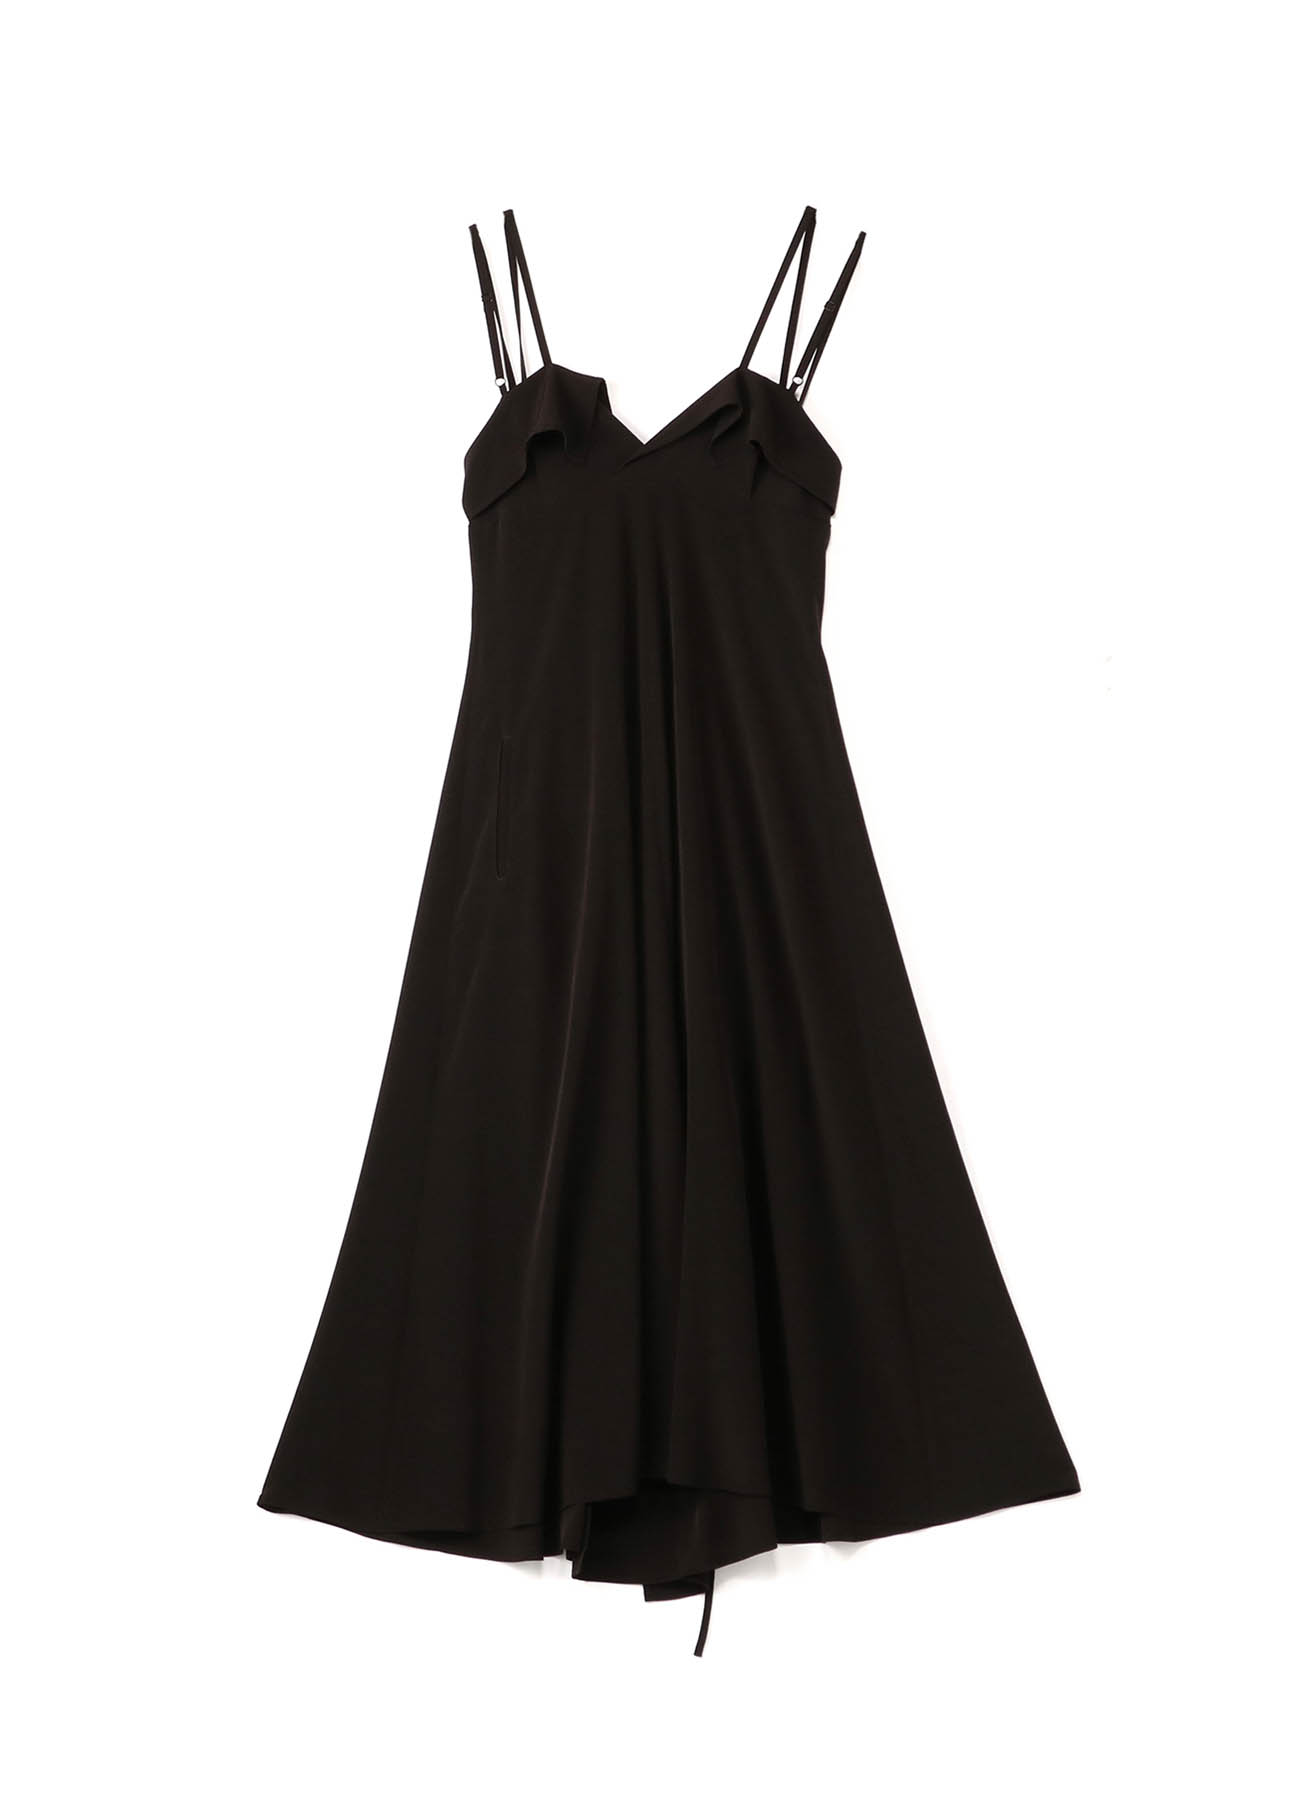 Ta/Pe de CHINE THIN STRAP DRESS